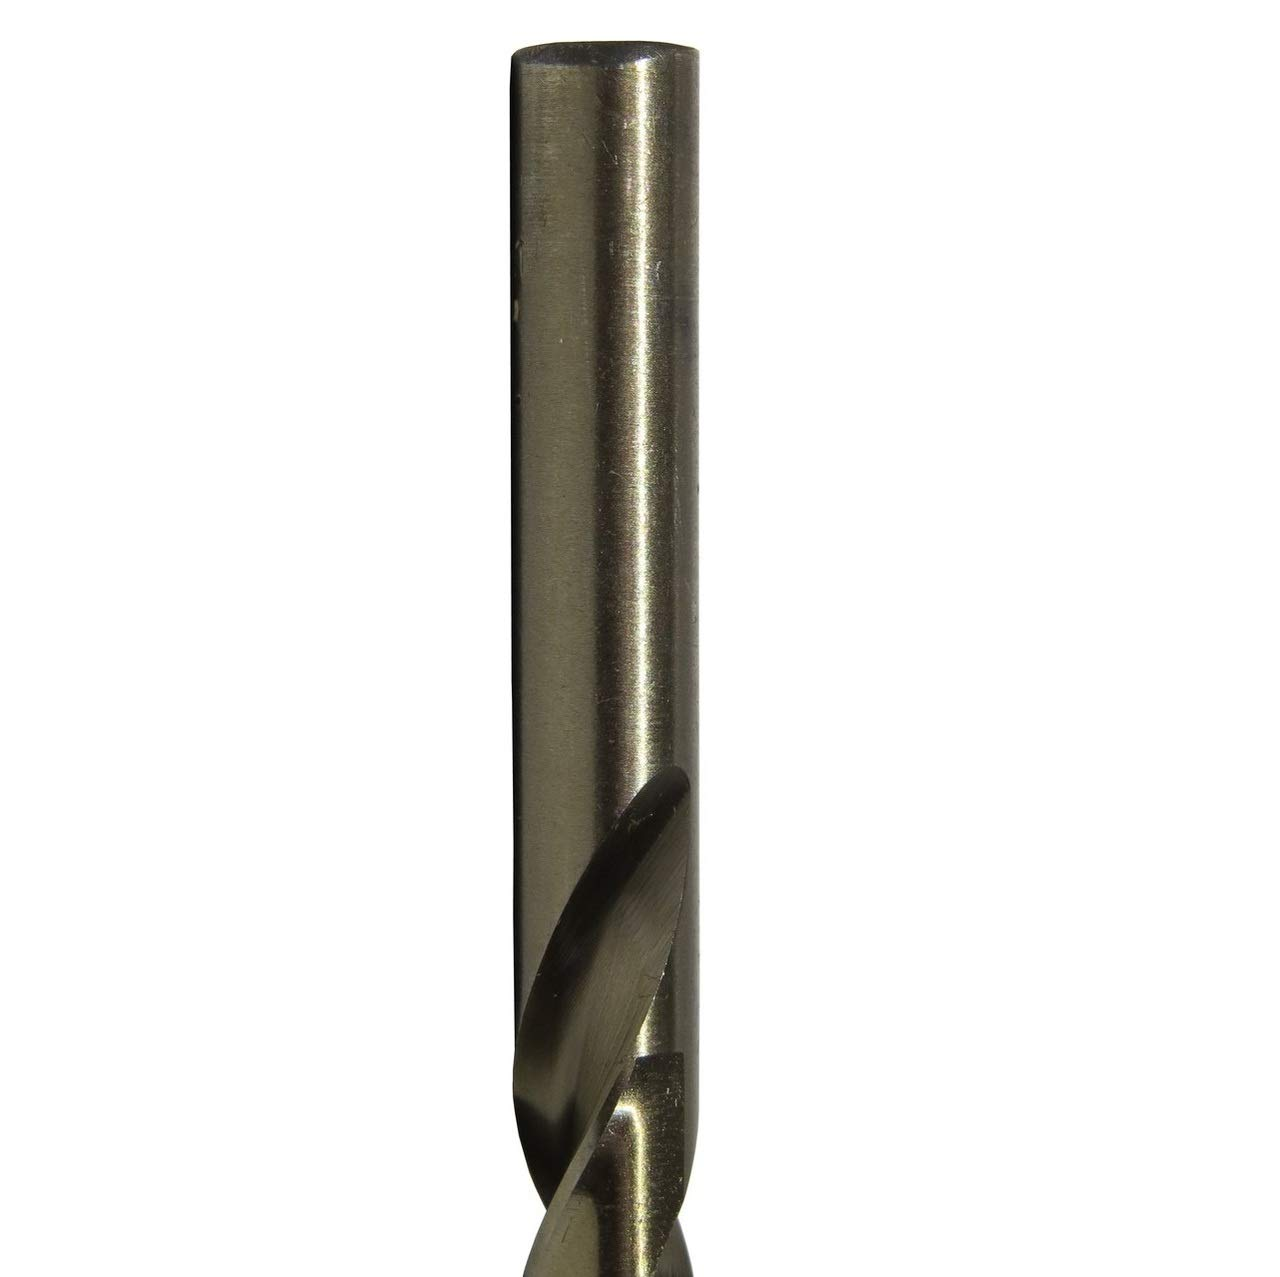 Pack of 6 D//ACO Series Drill America 1//2 Cobalt Heavy Duty Drill Bit